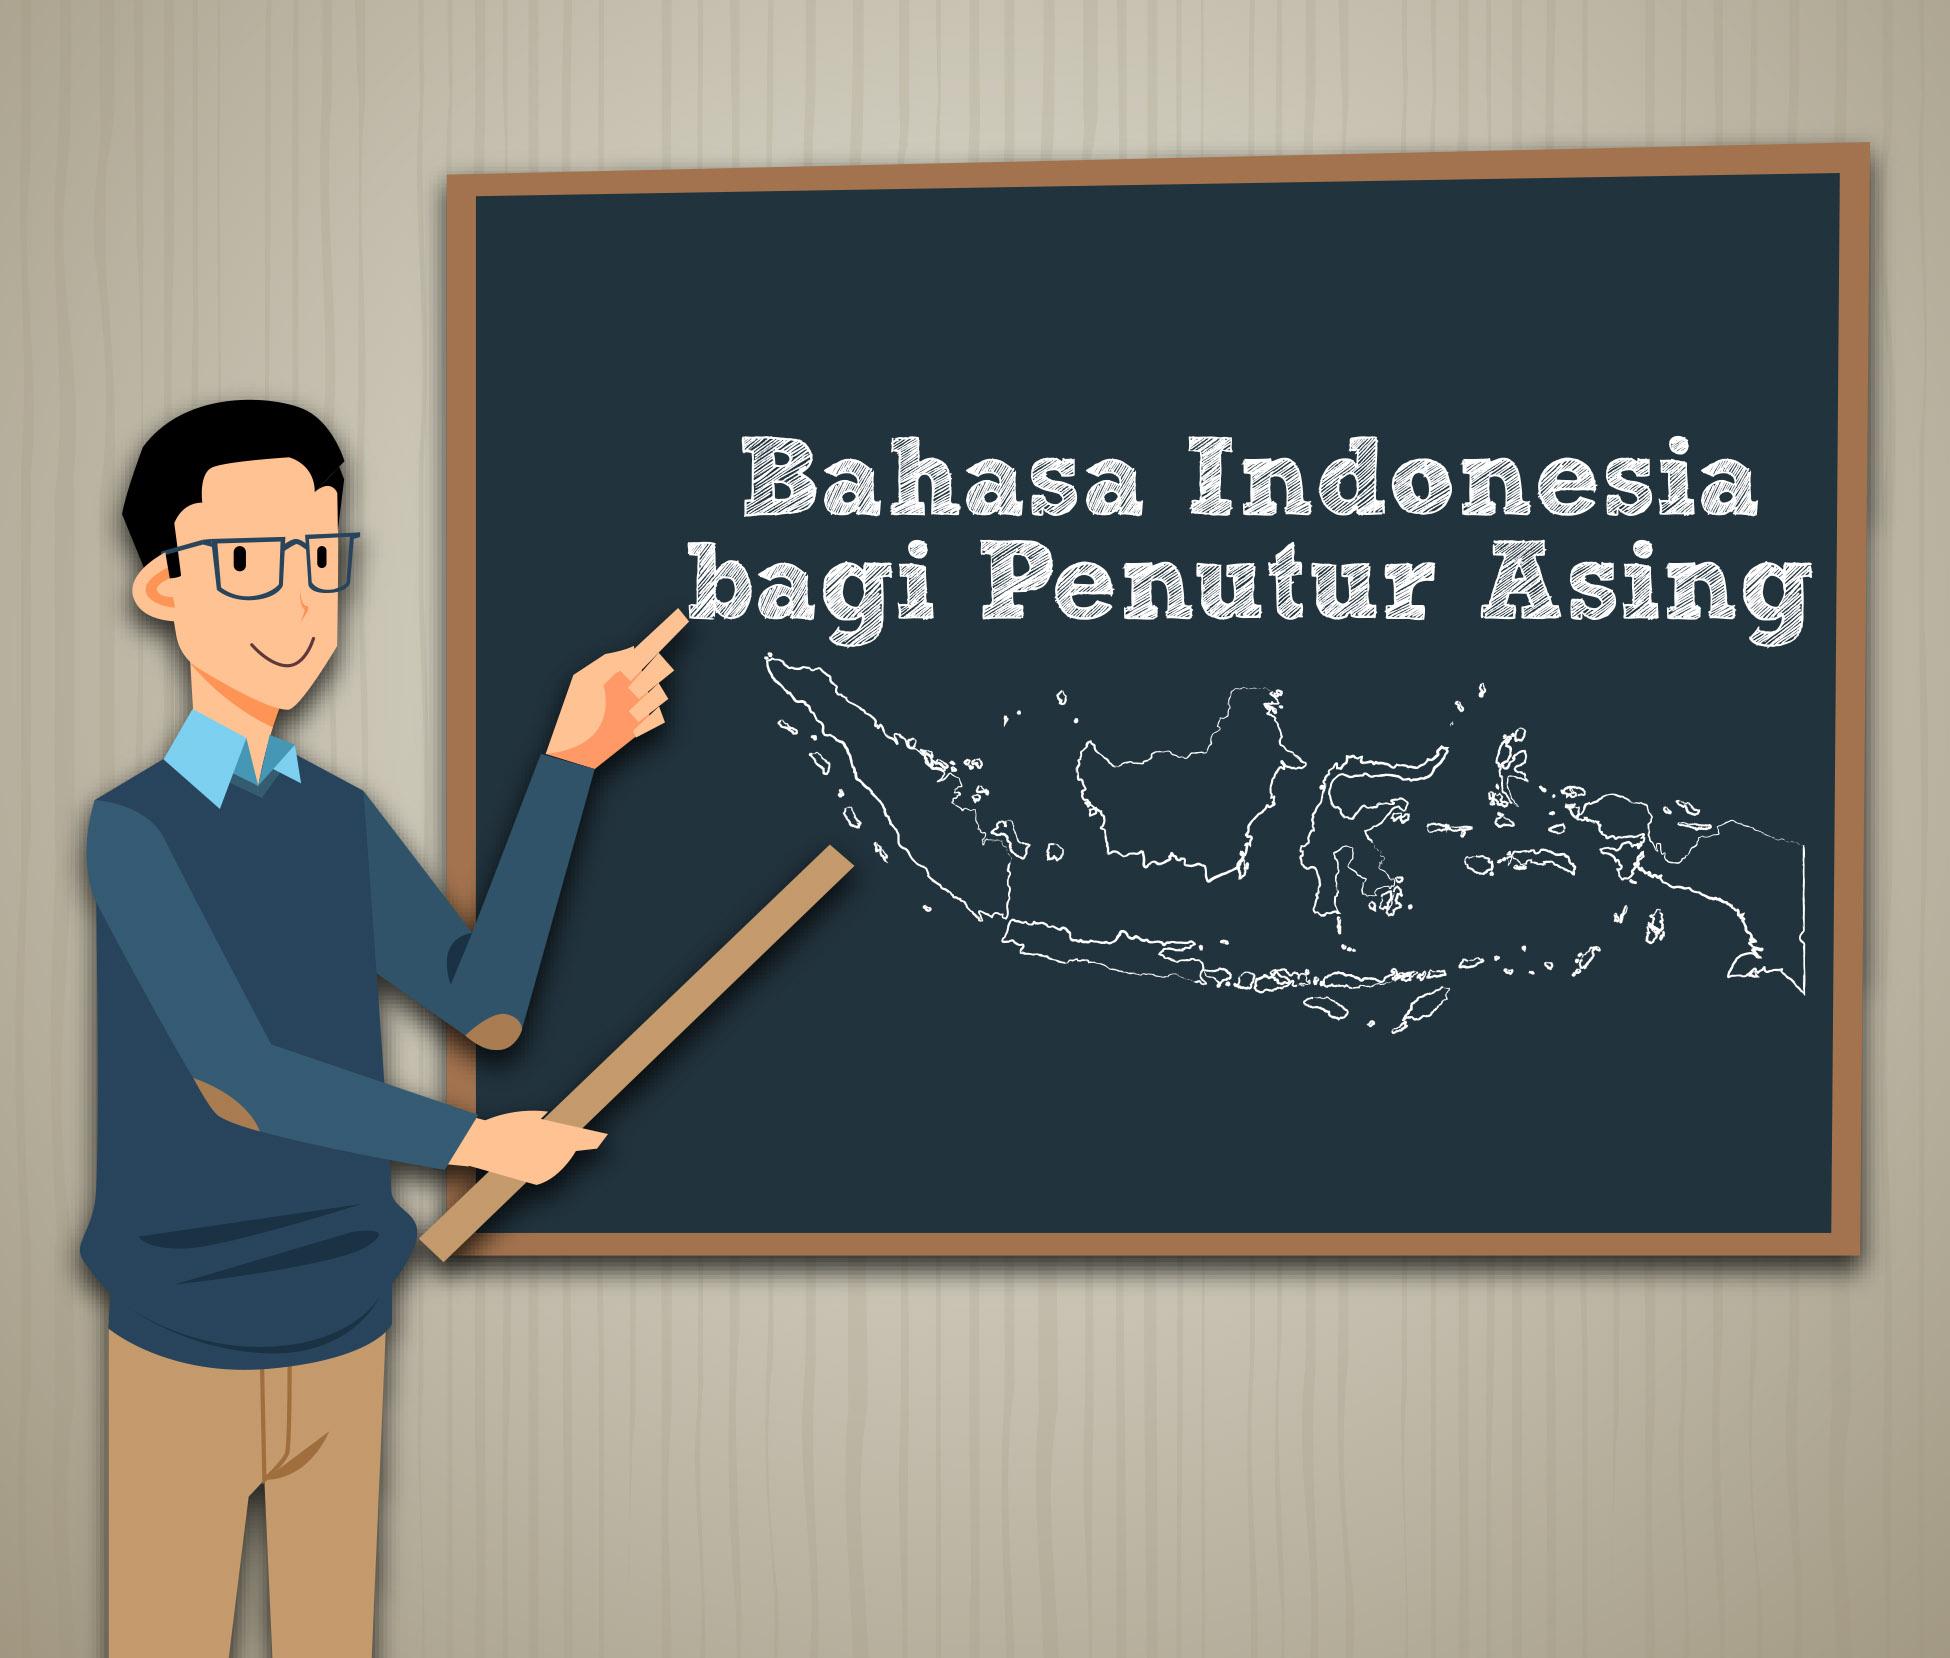 Seleksi Calon Tenaga Pengajar Bahasa Indonesia bagi Penutur Asing (BIPA) untuk Luar Negeri Masa Penugasan 2019